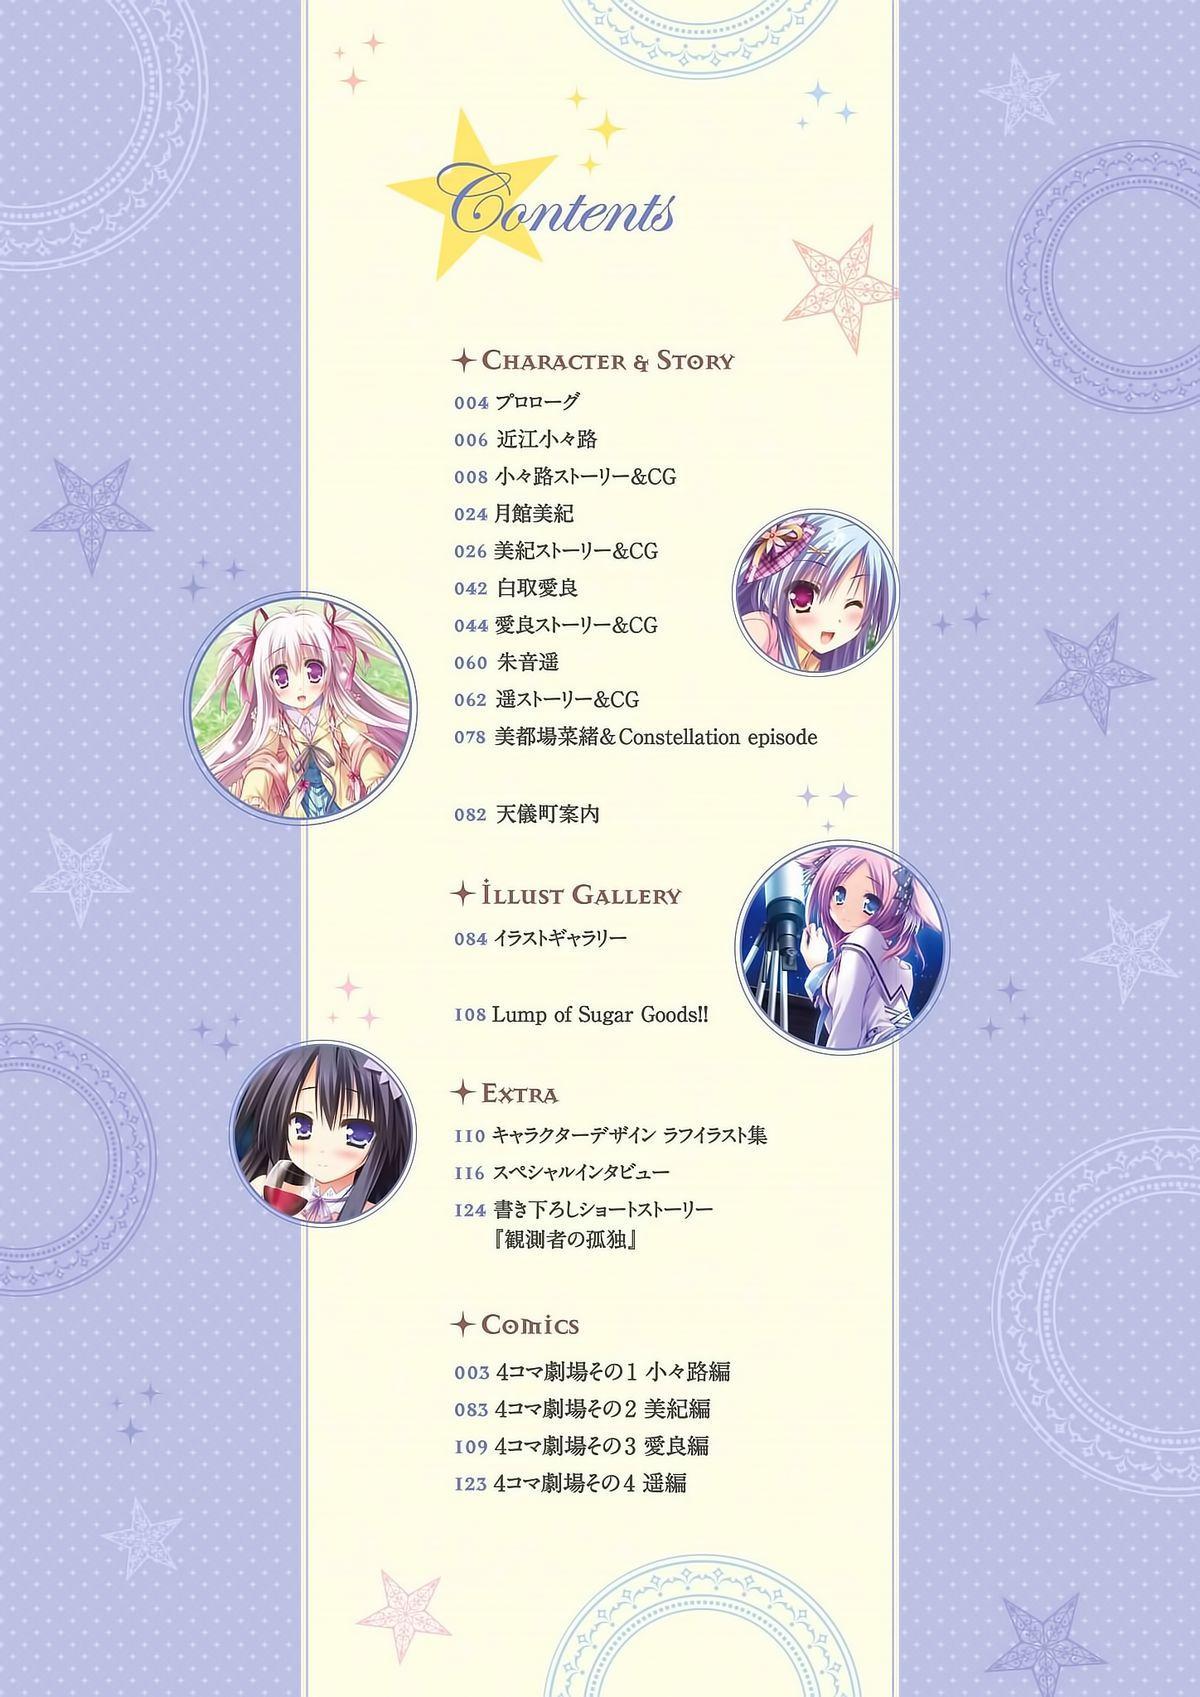 Sekai to Sekai no Mannaka de Visual Fanbook 3